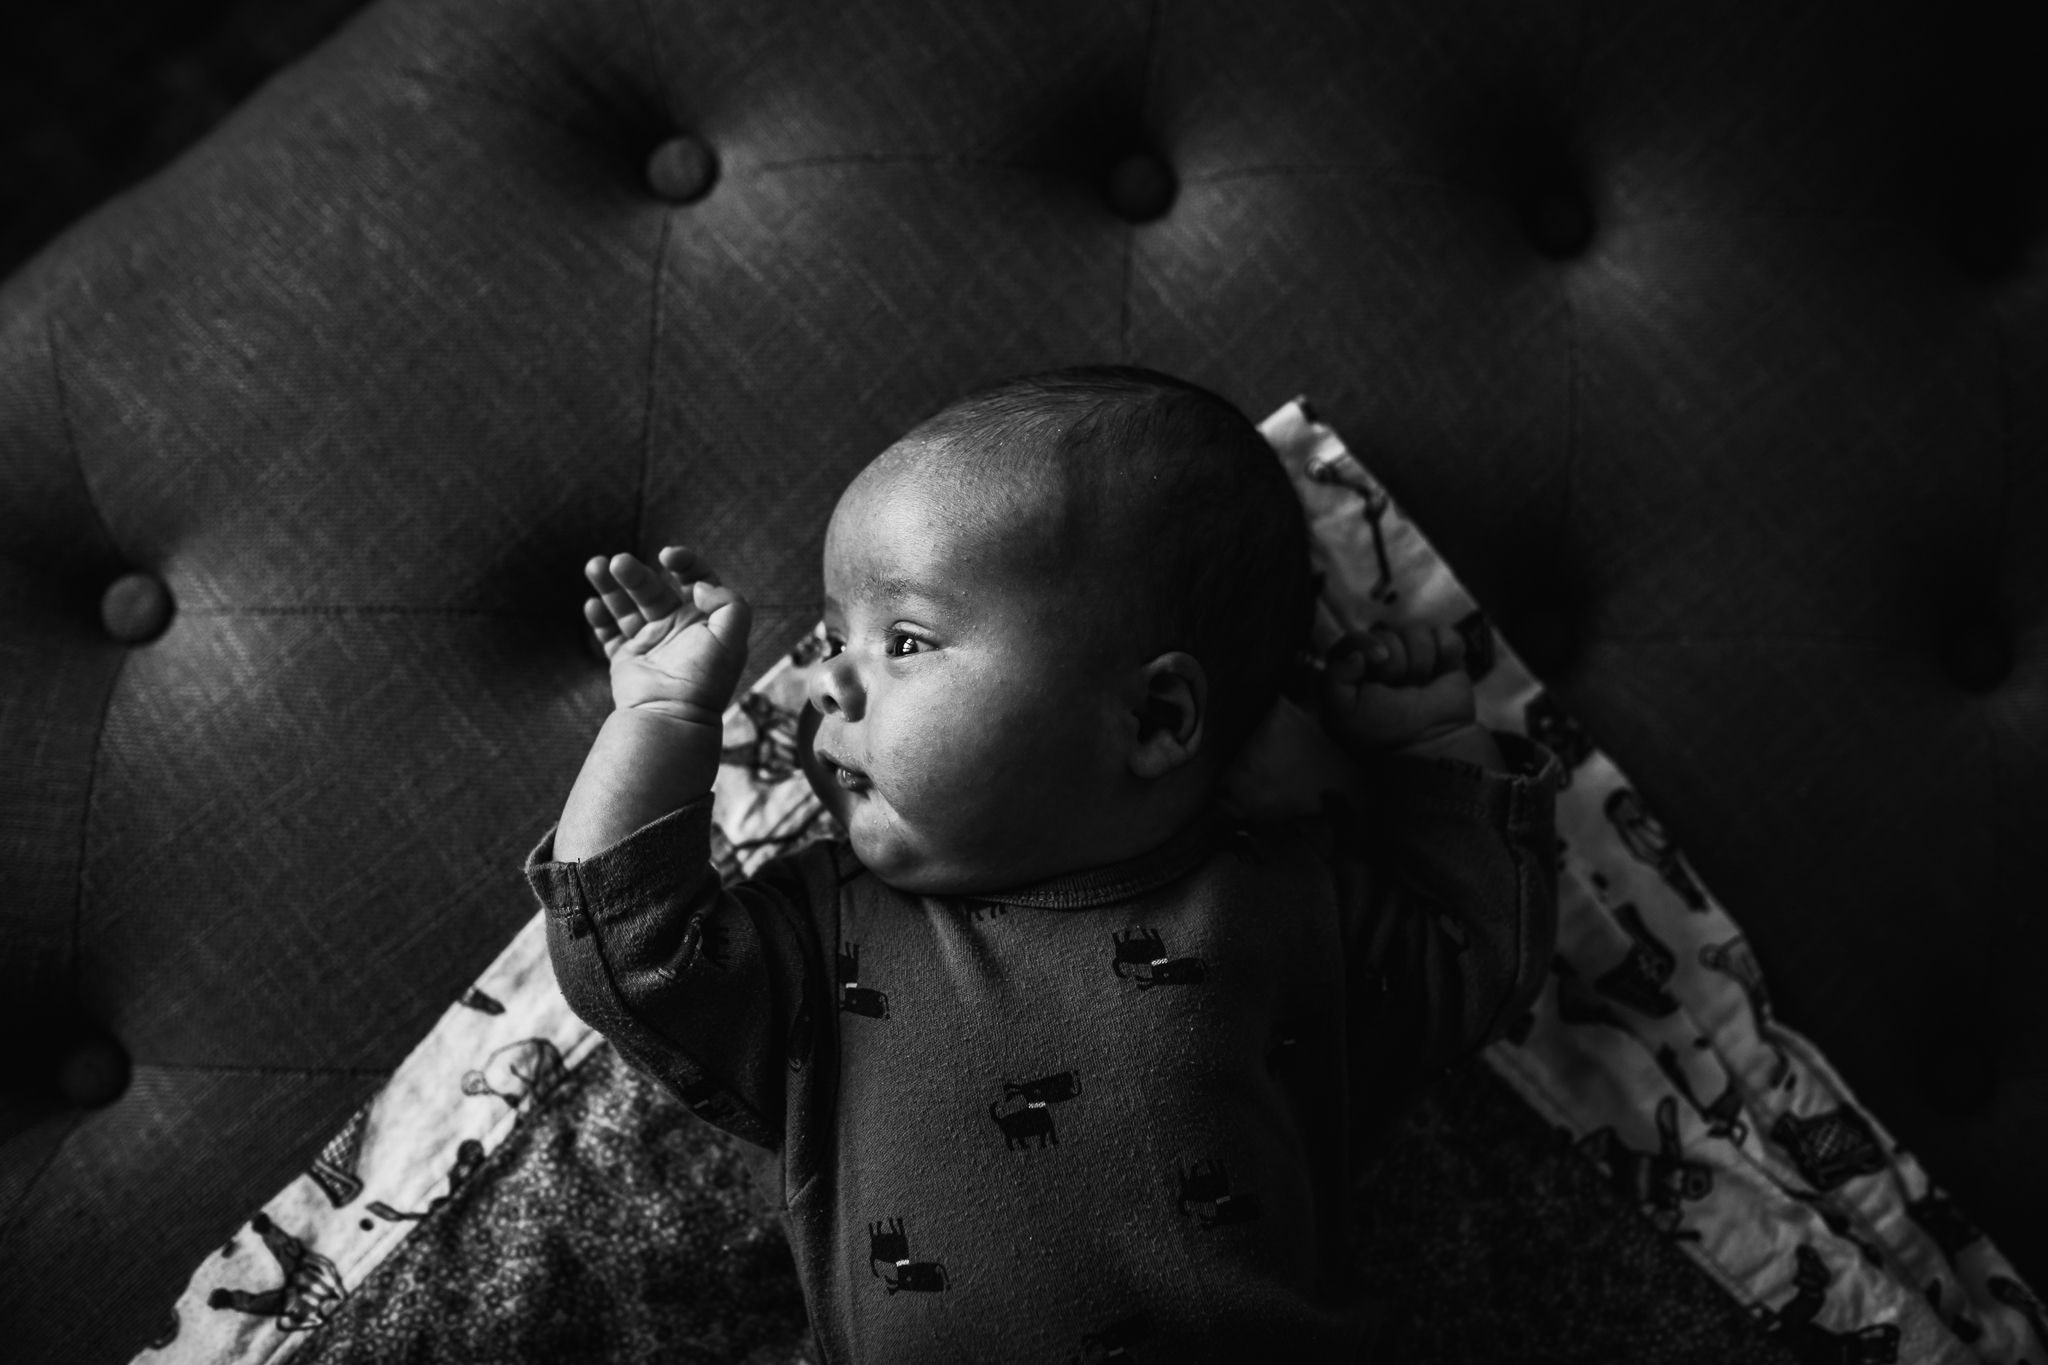 Alina-Joy-Photography-Cold-Lake-Photographer-3-3.jpg